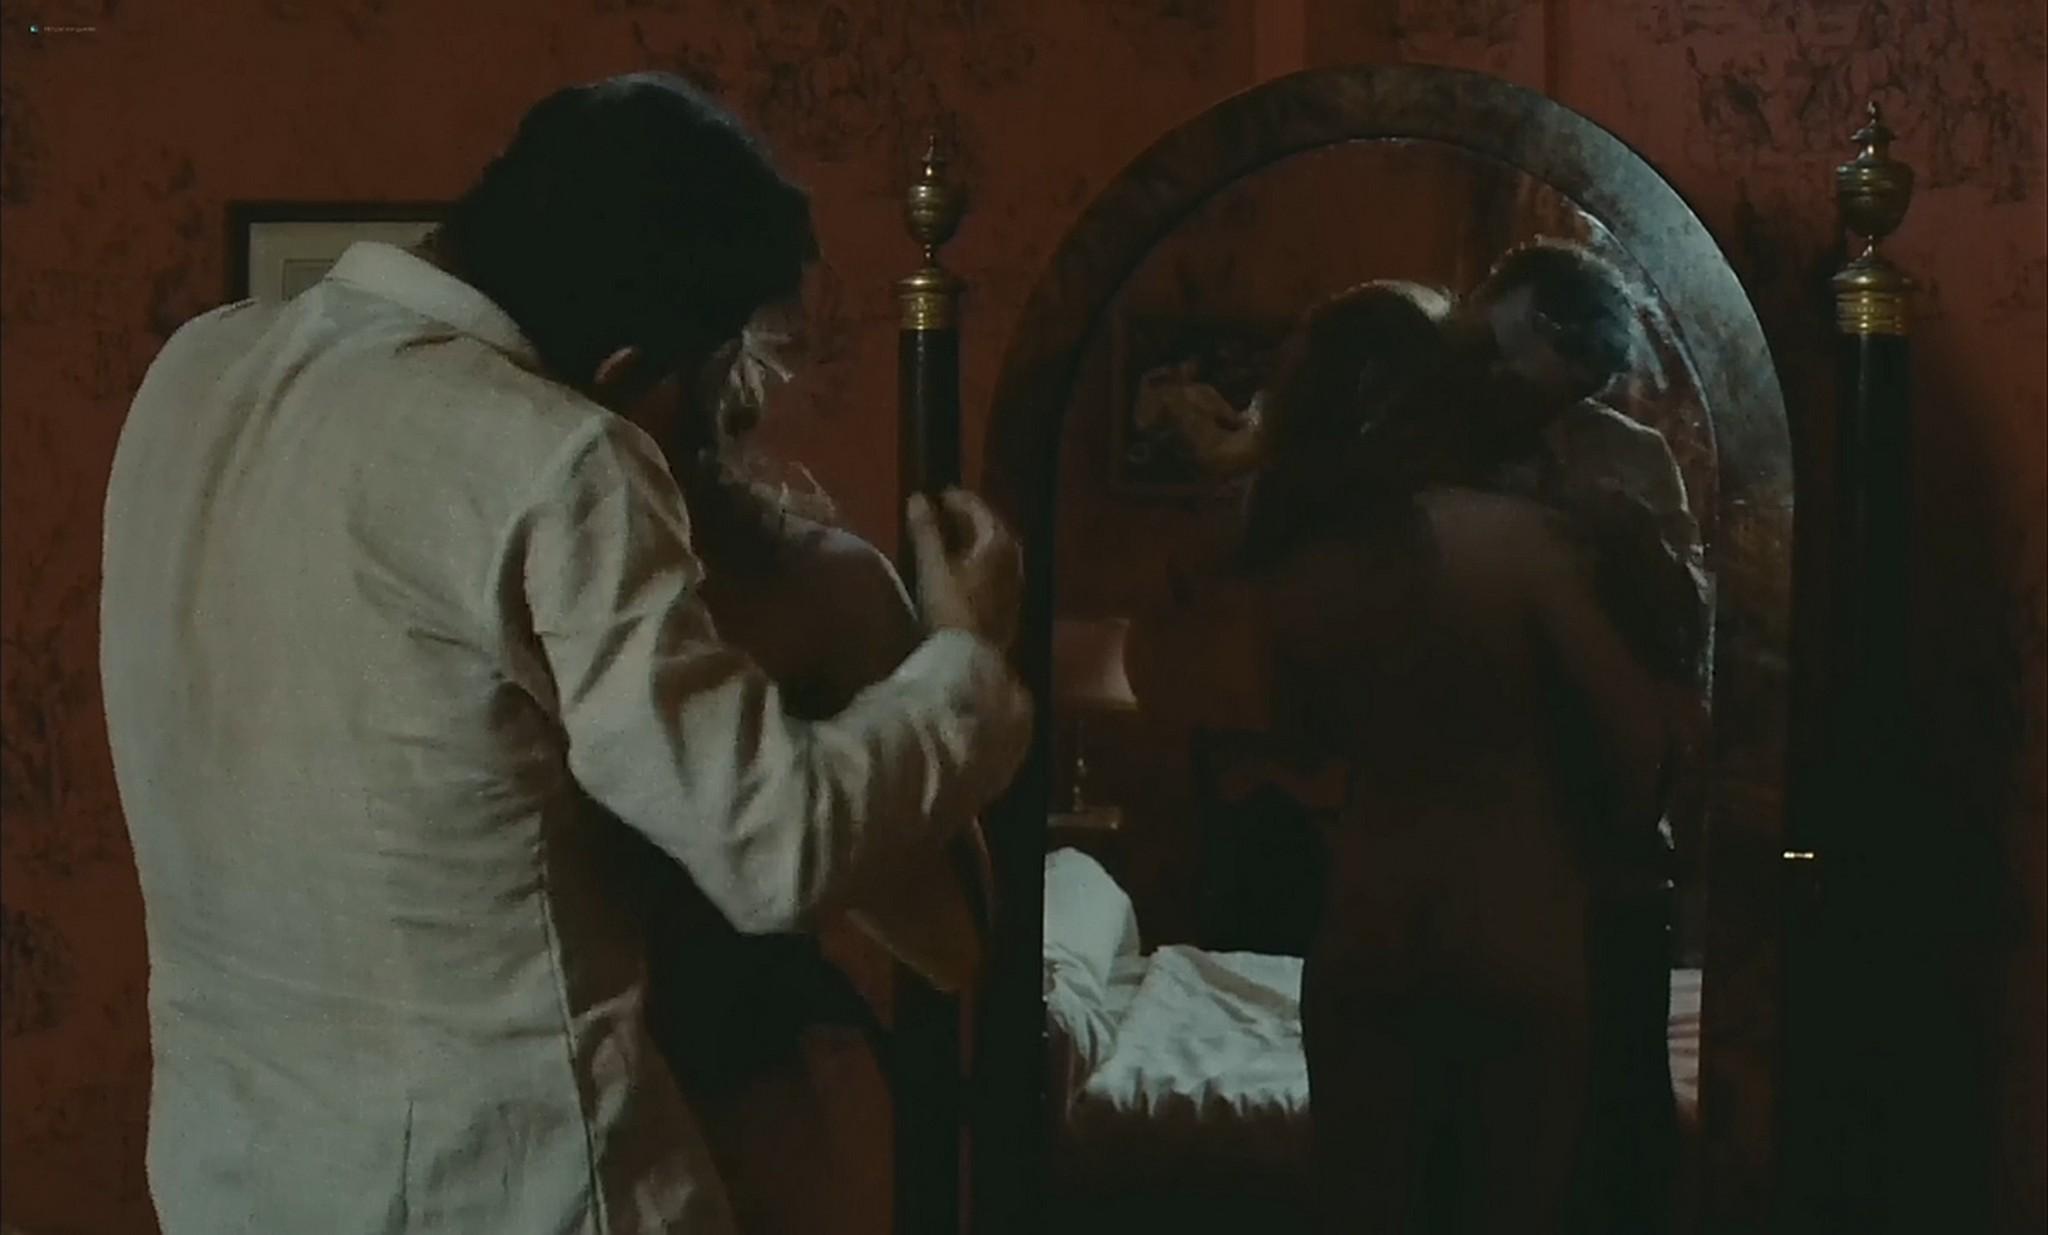 Nathalie Baye nude Marie Blanche Dehaux full frontal etc La gueule ouverte FR 1974 720p 3